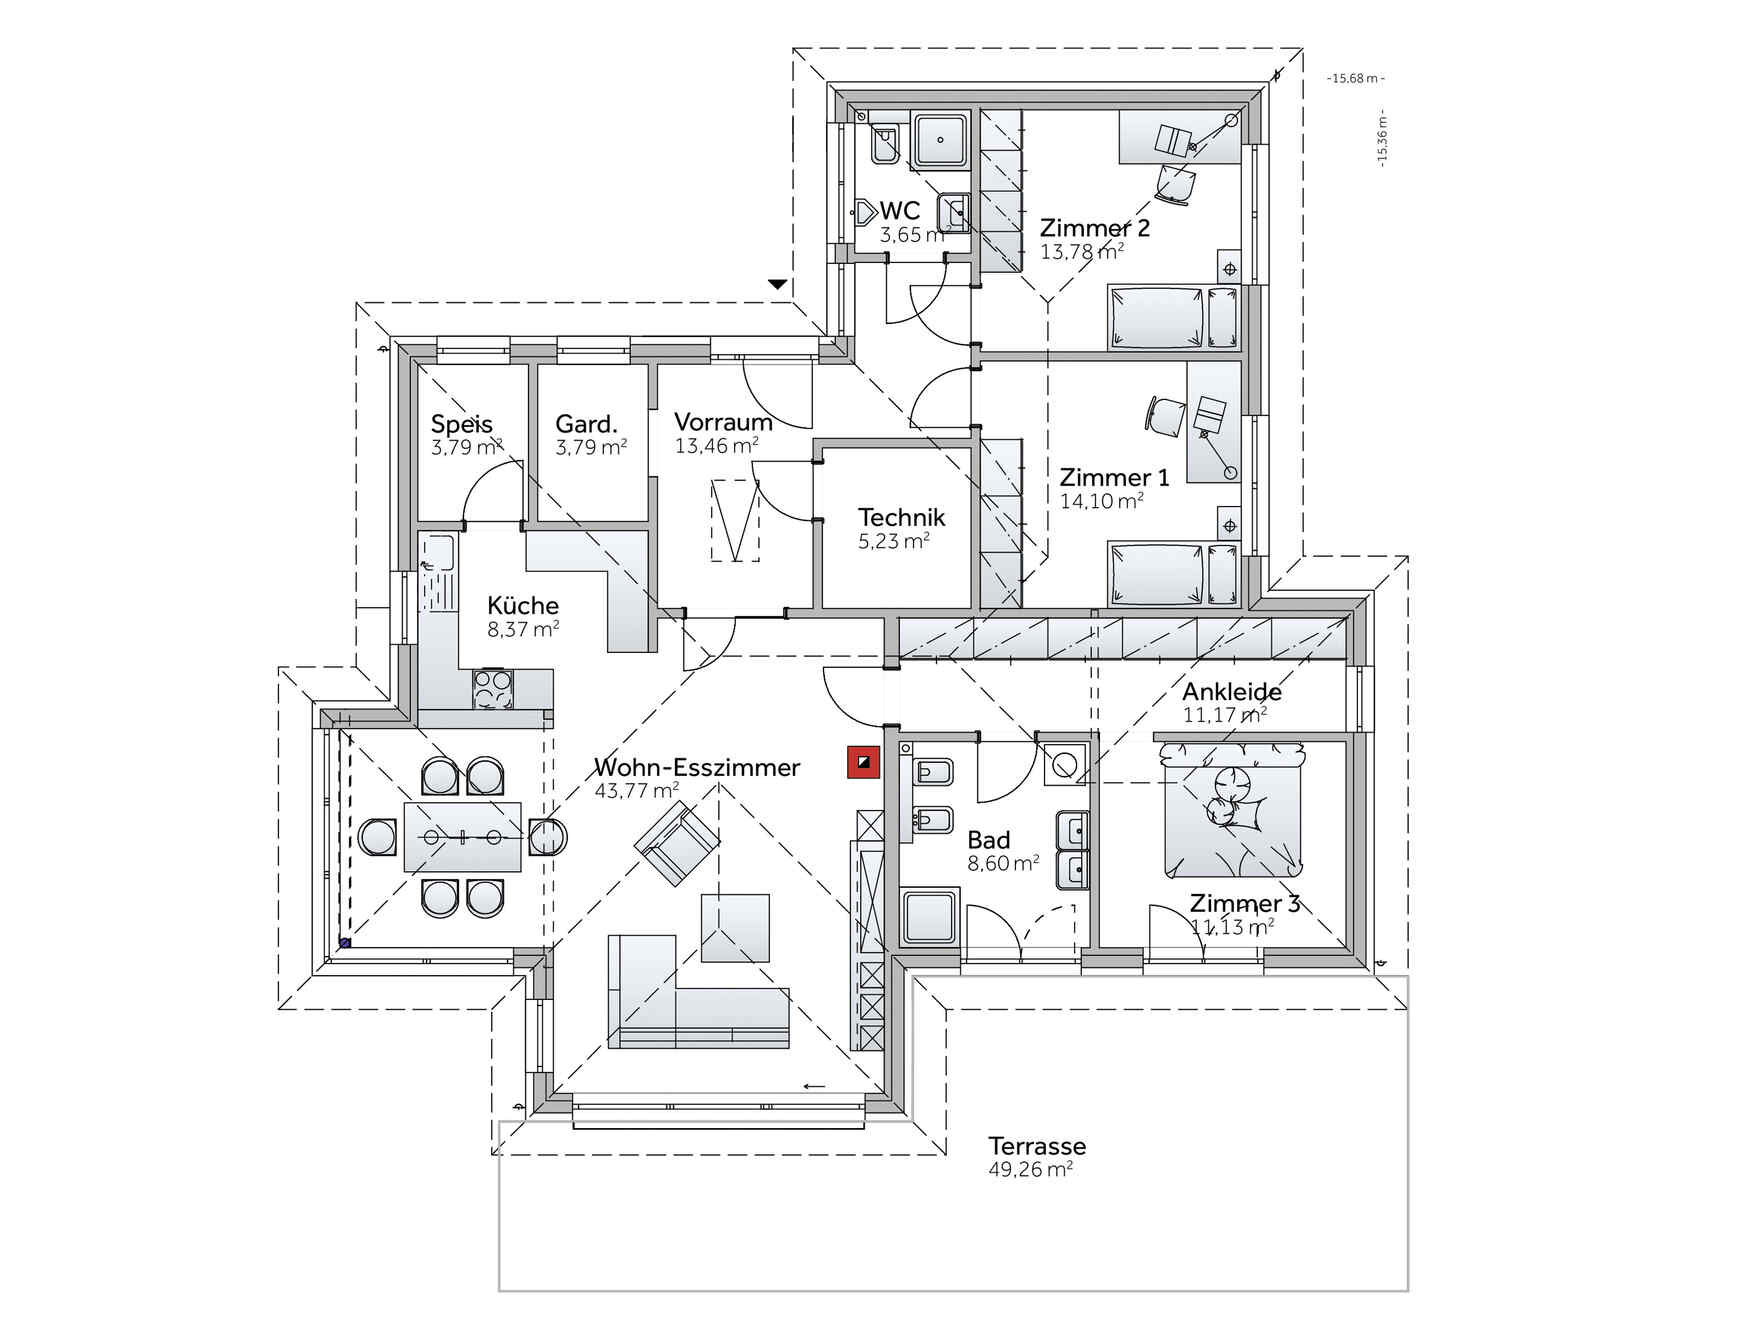 Musterhaus bungalow flachdach  Musterhaus Bungalow S141 Graz - Besichtigung, Planung & Kauf ...